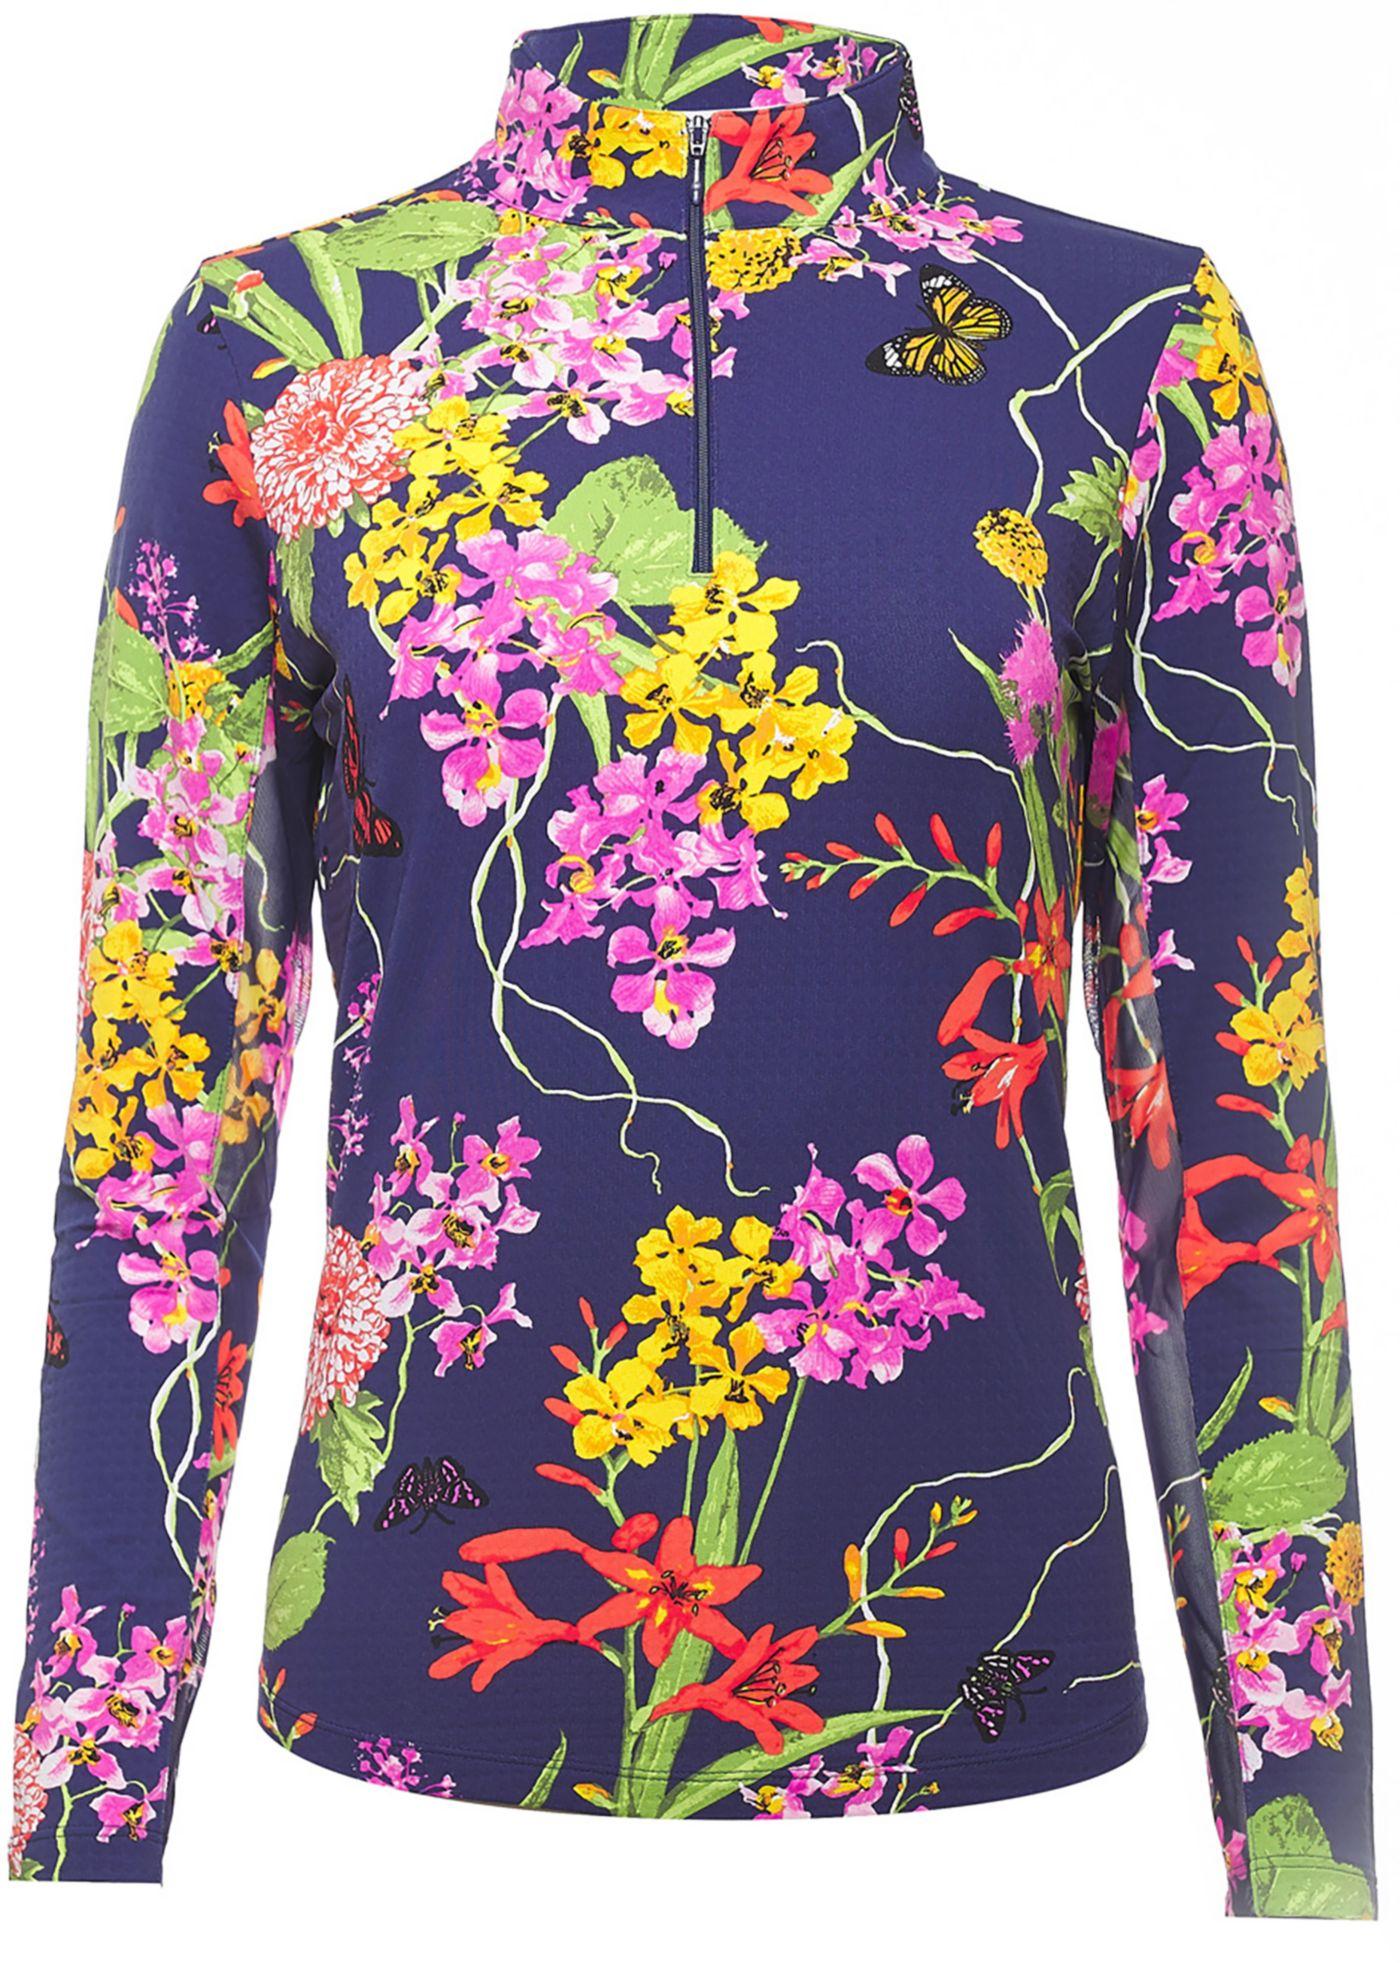 IBKUL Women's Willow Print Mock Neck Golf Pullover